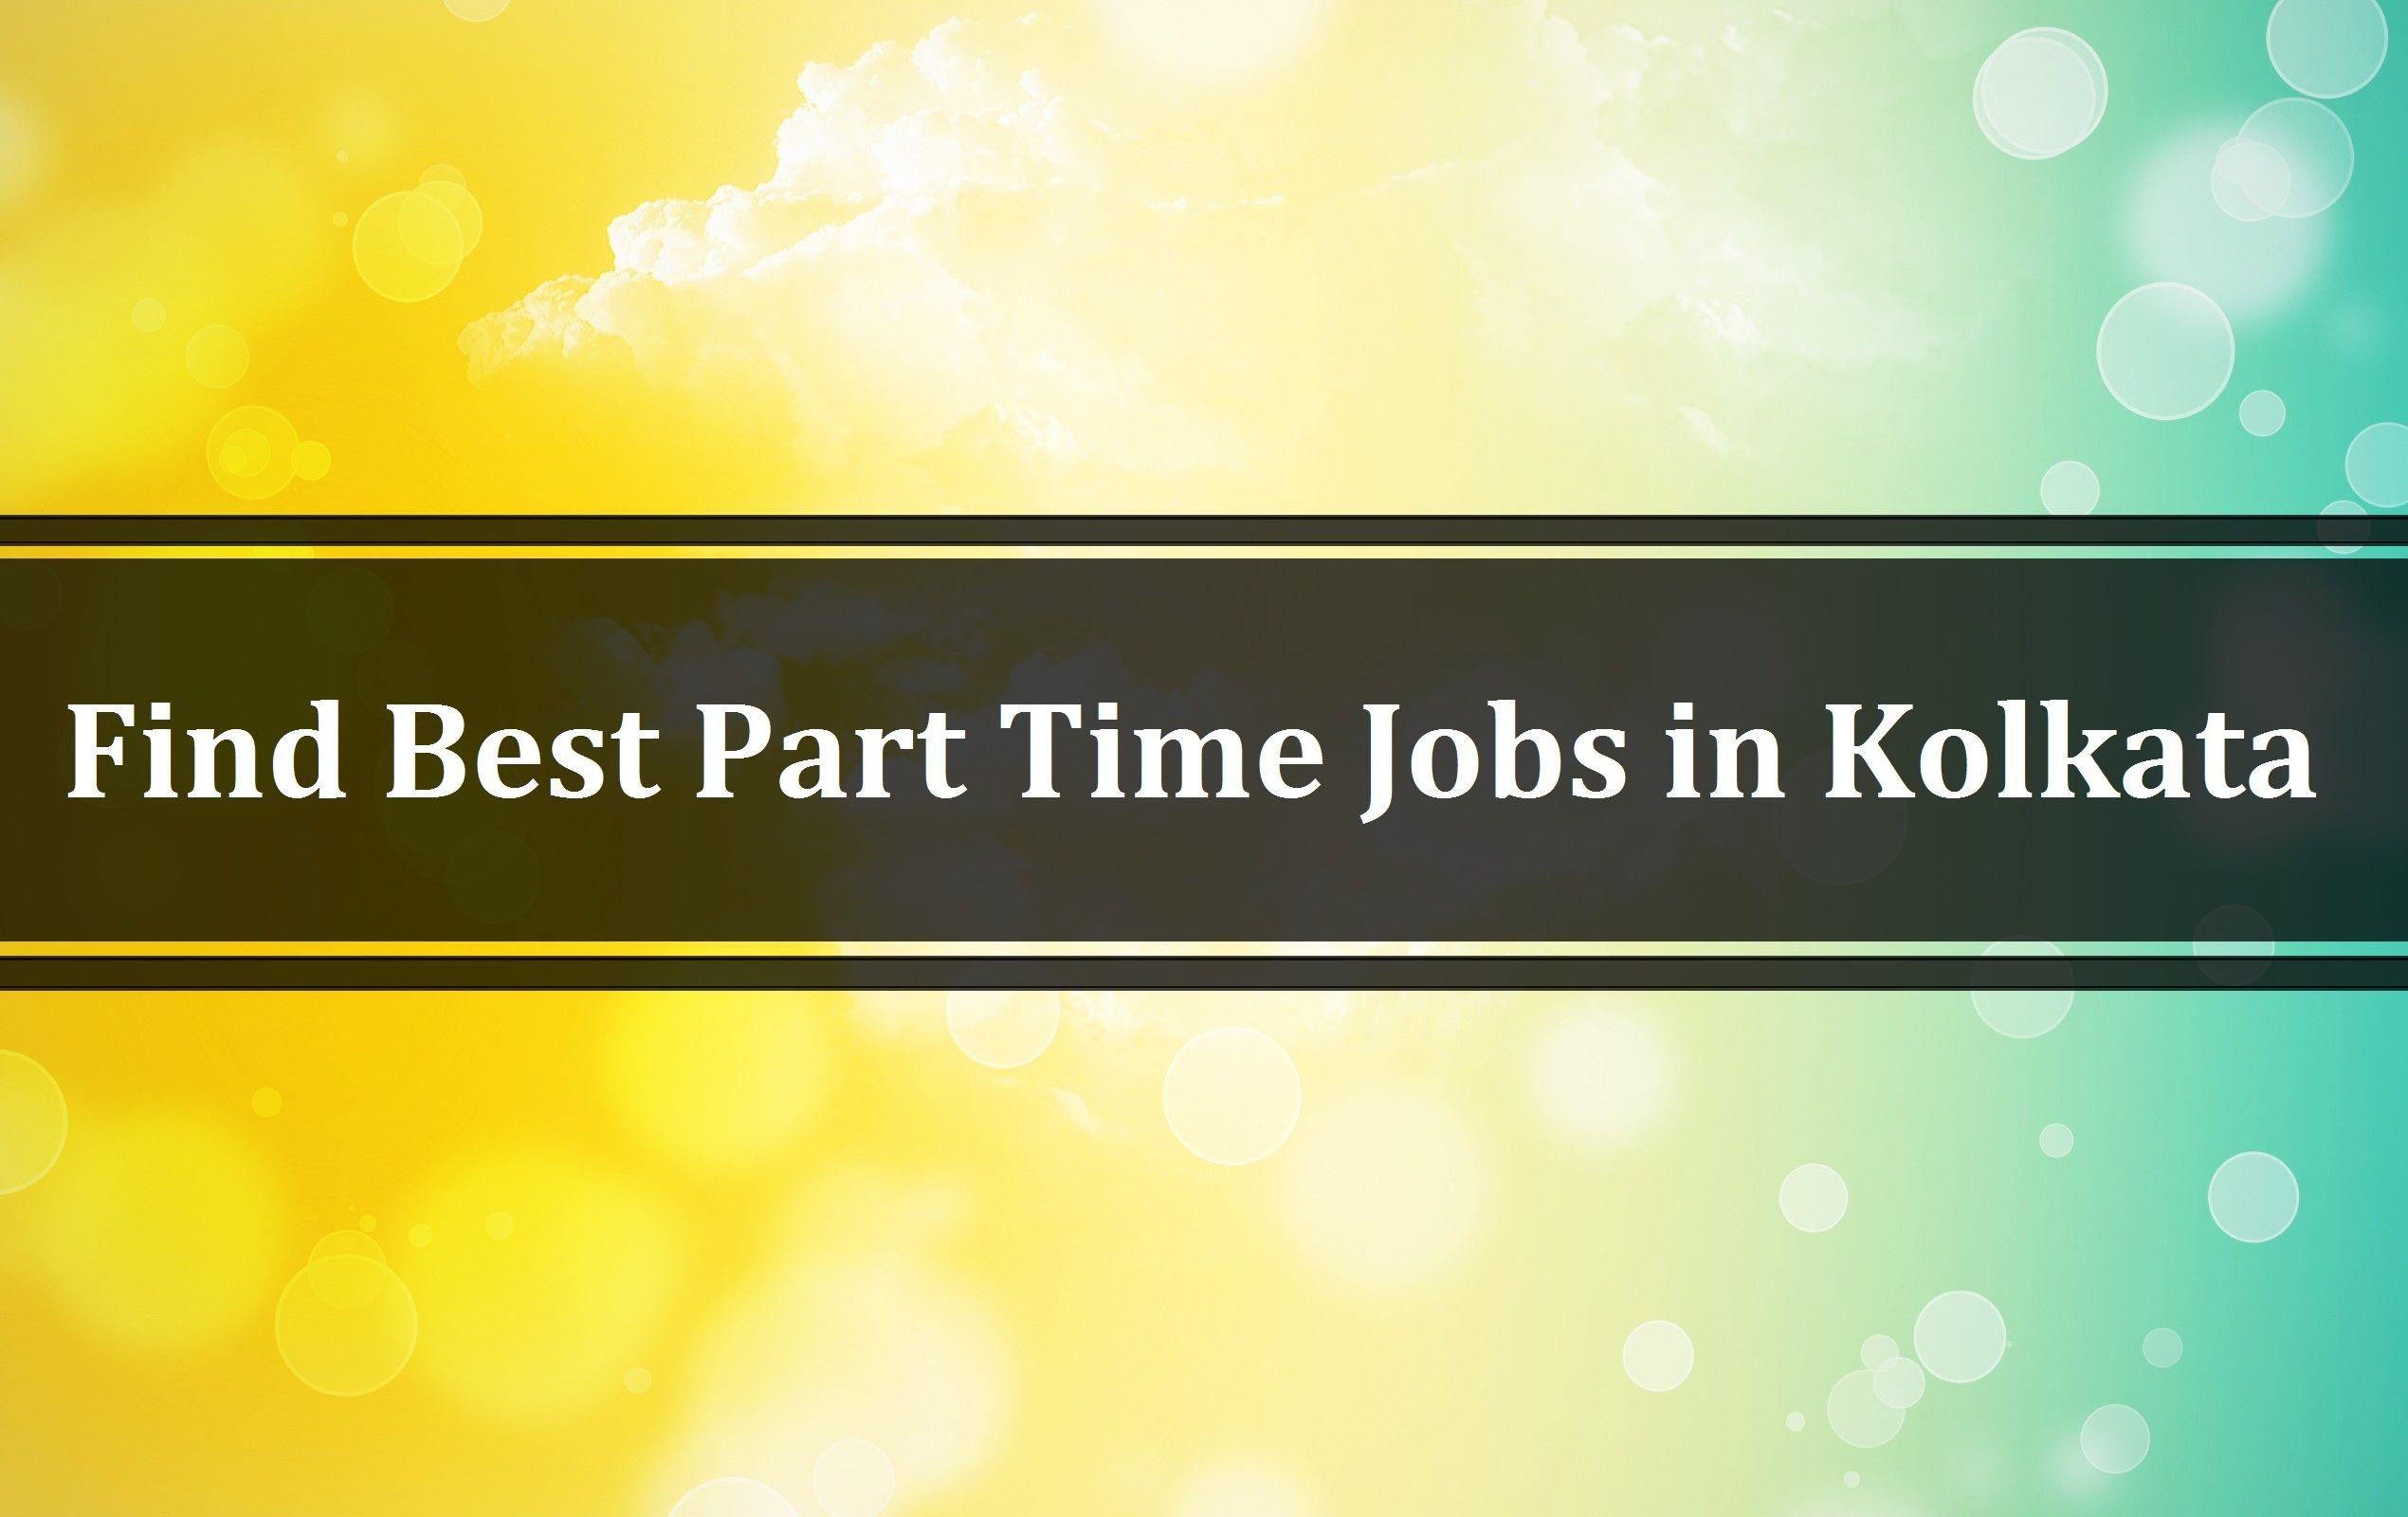 Search Part Time Jobs In Kolkata Part Time Job Openings In Kolkata Tridindiahr Com Part Time Jobs Best Part Time Jobs Job Opening